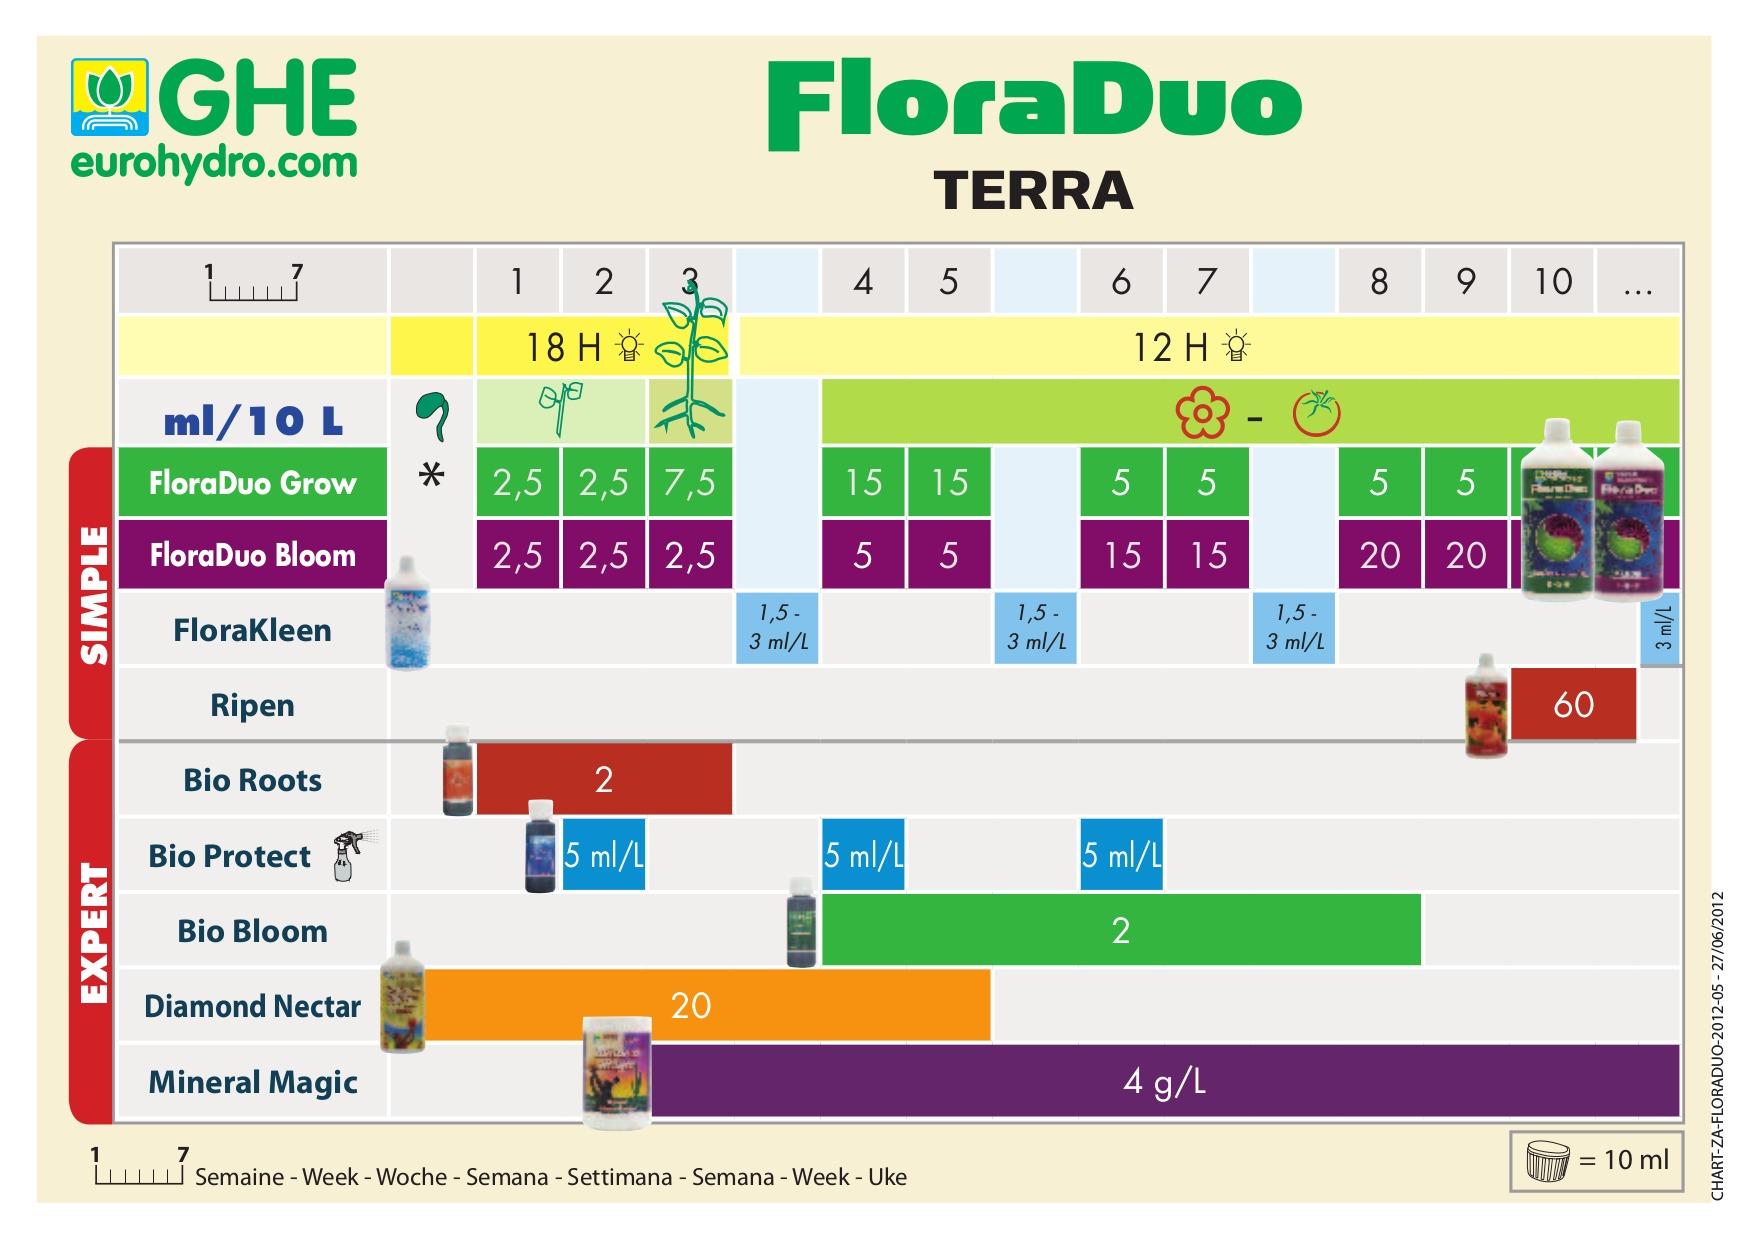 GHE Duo Terra